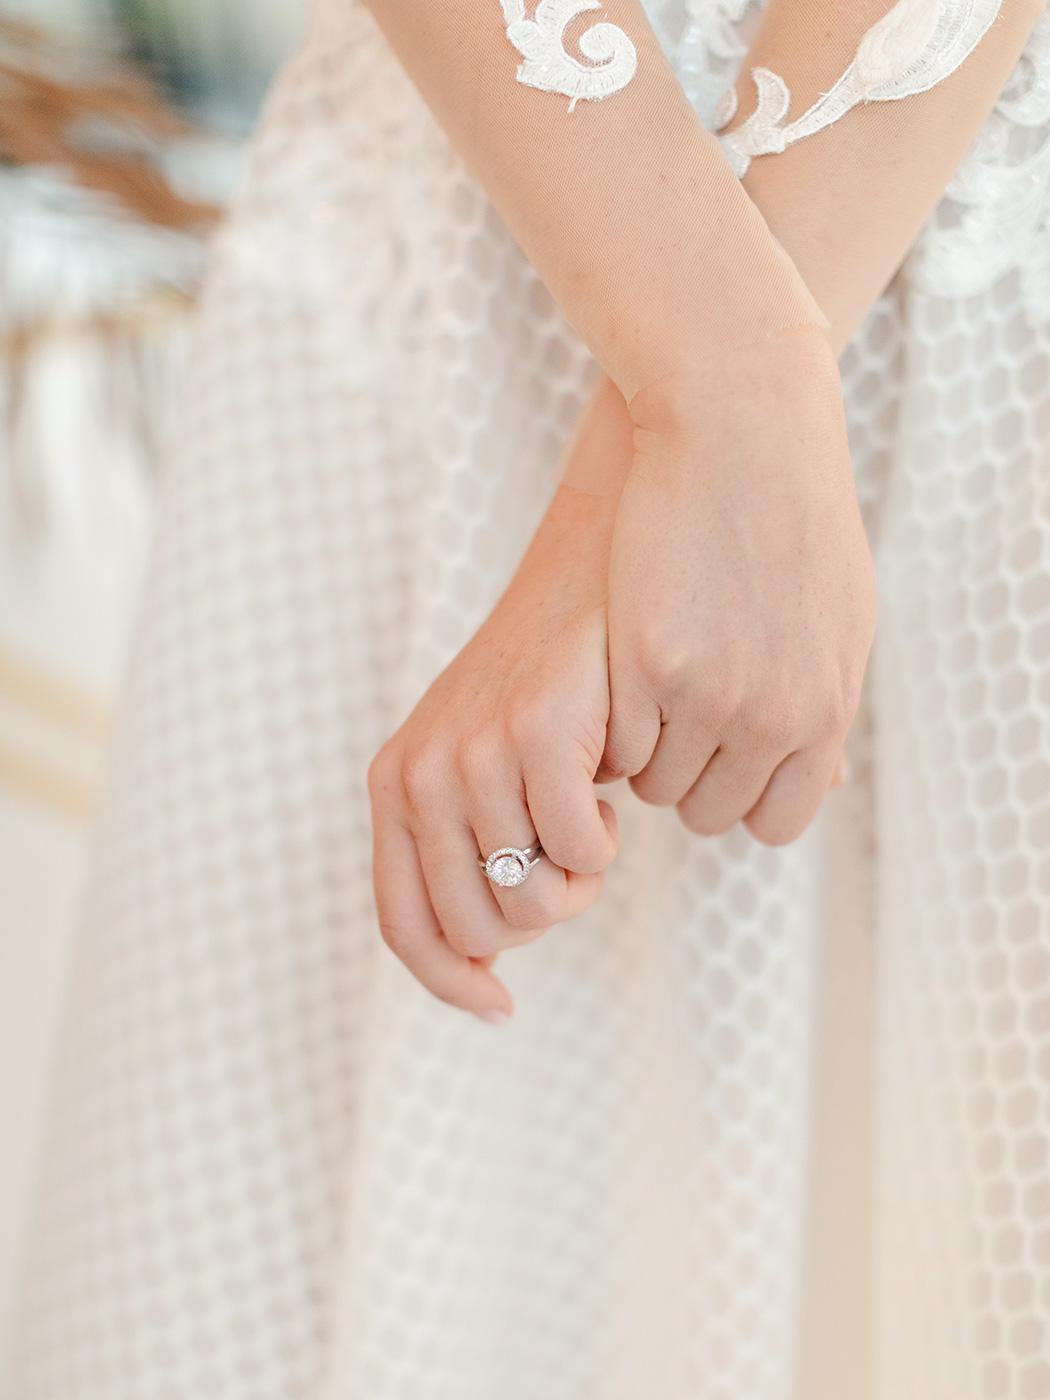 Ring by Taneka Storm Jewellery   Rensche Mari